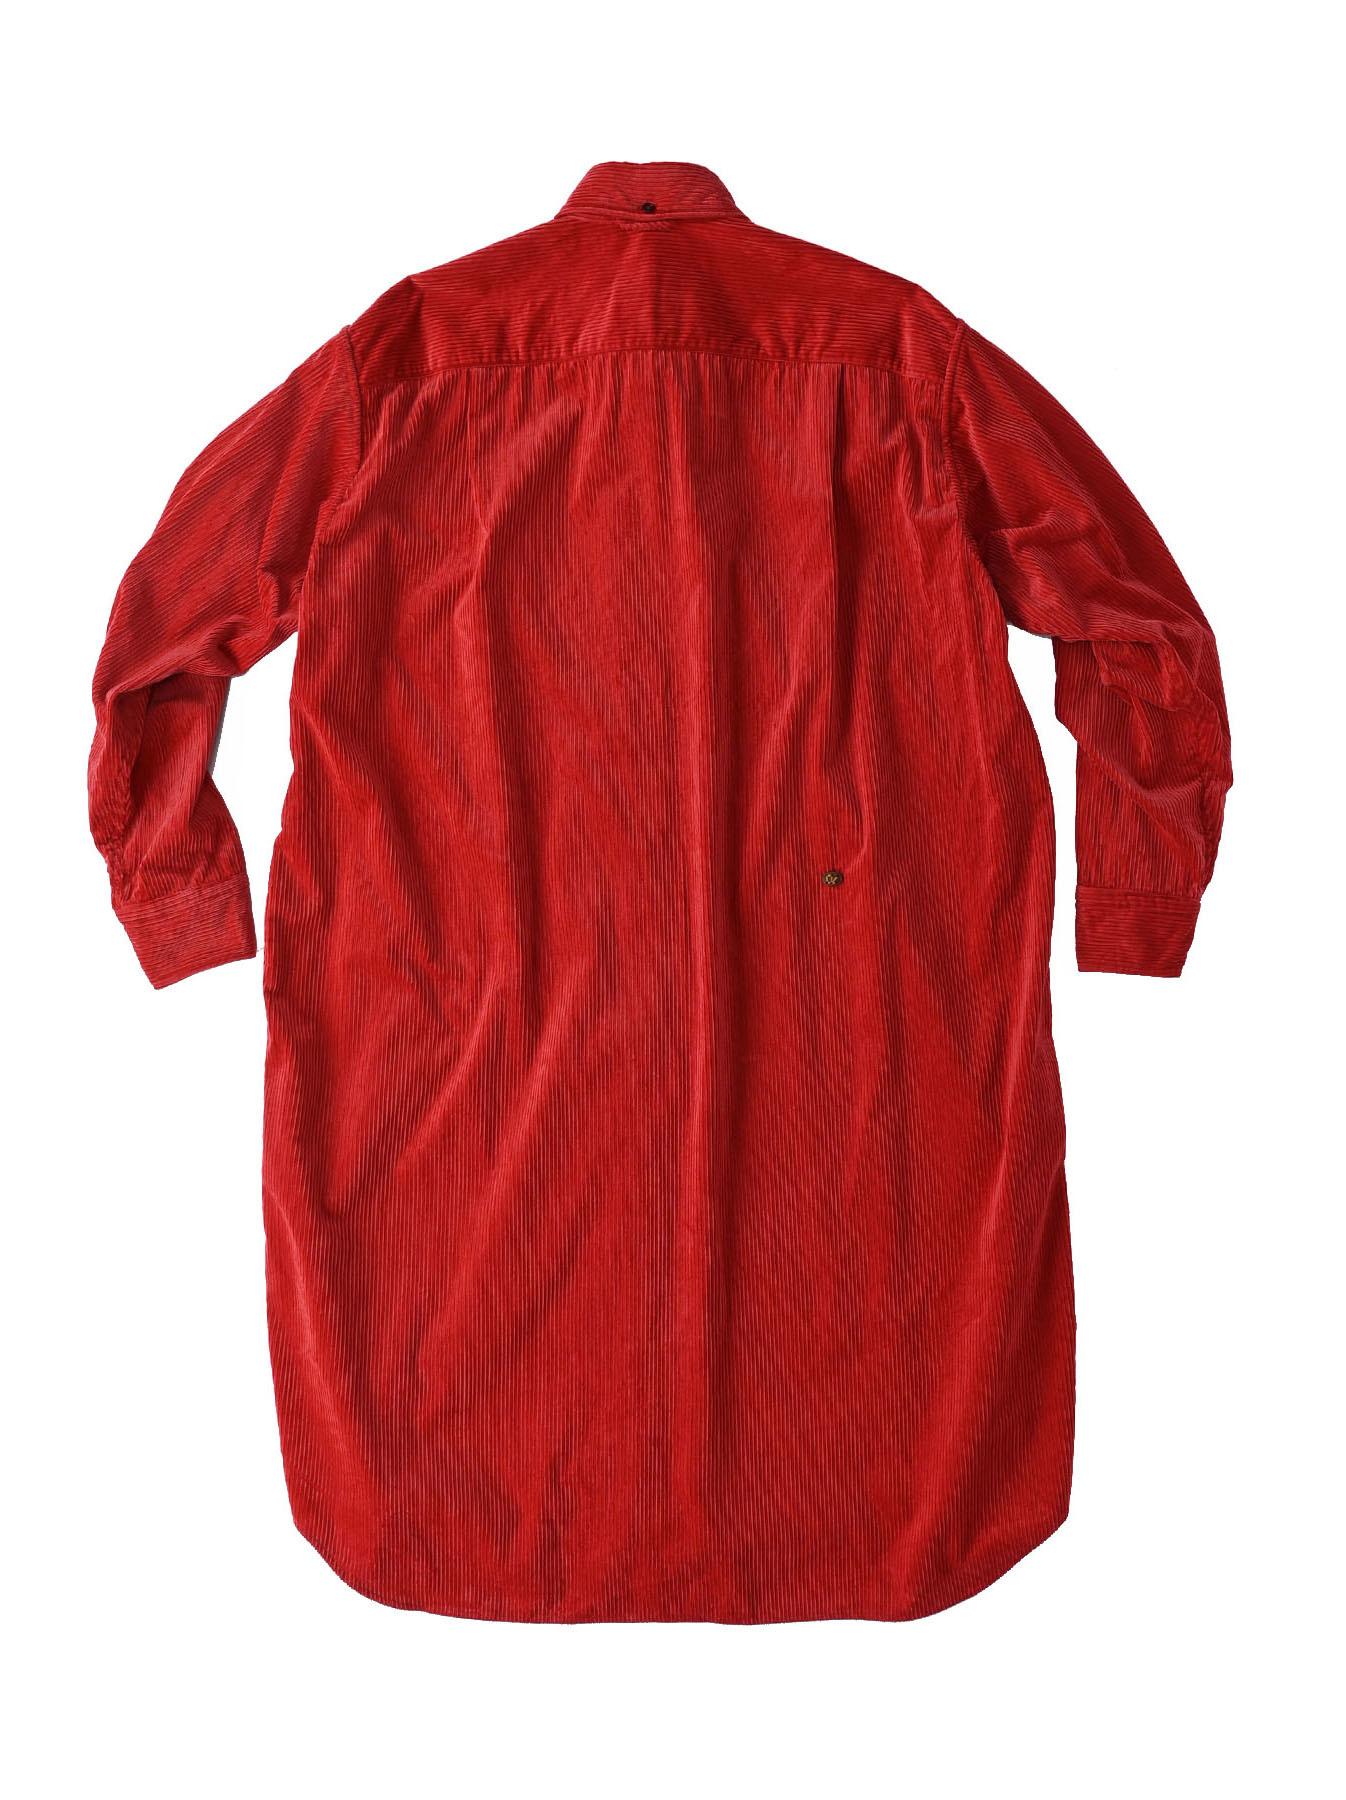 Kutekute Corduroy Smock Dress-4